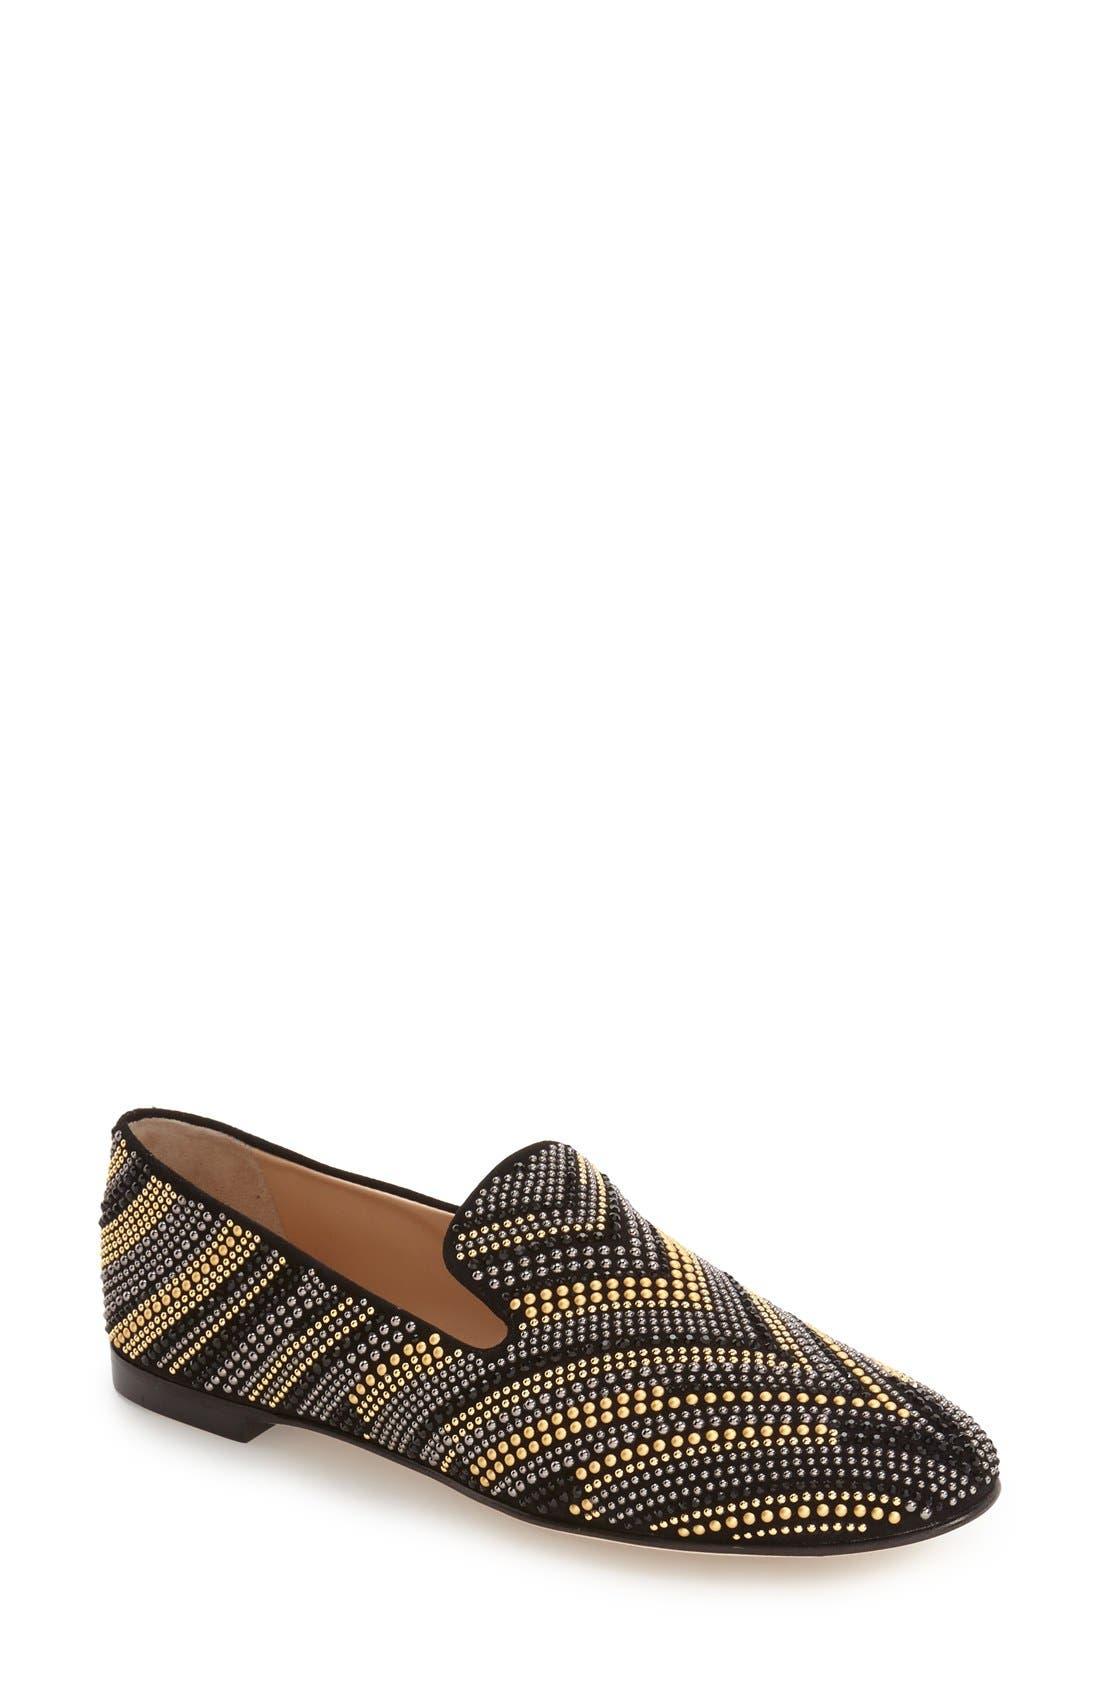 GIUSEPPE ZANOTTI 'Dalila - Embellished' Swarovski Crystal Loafer